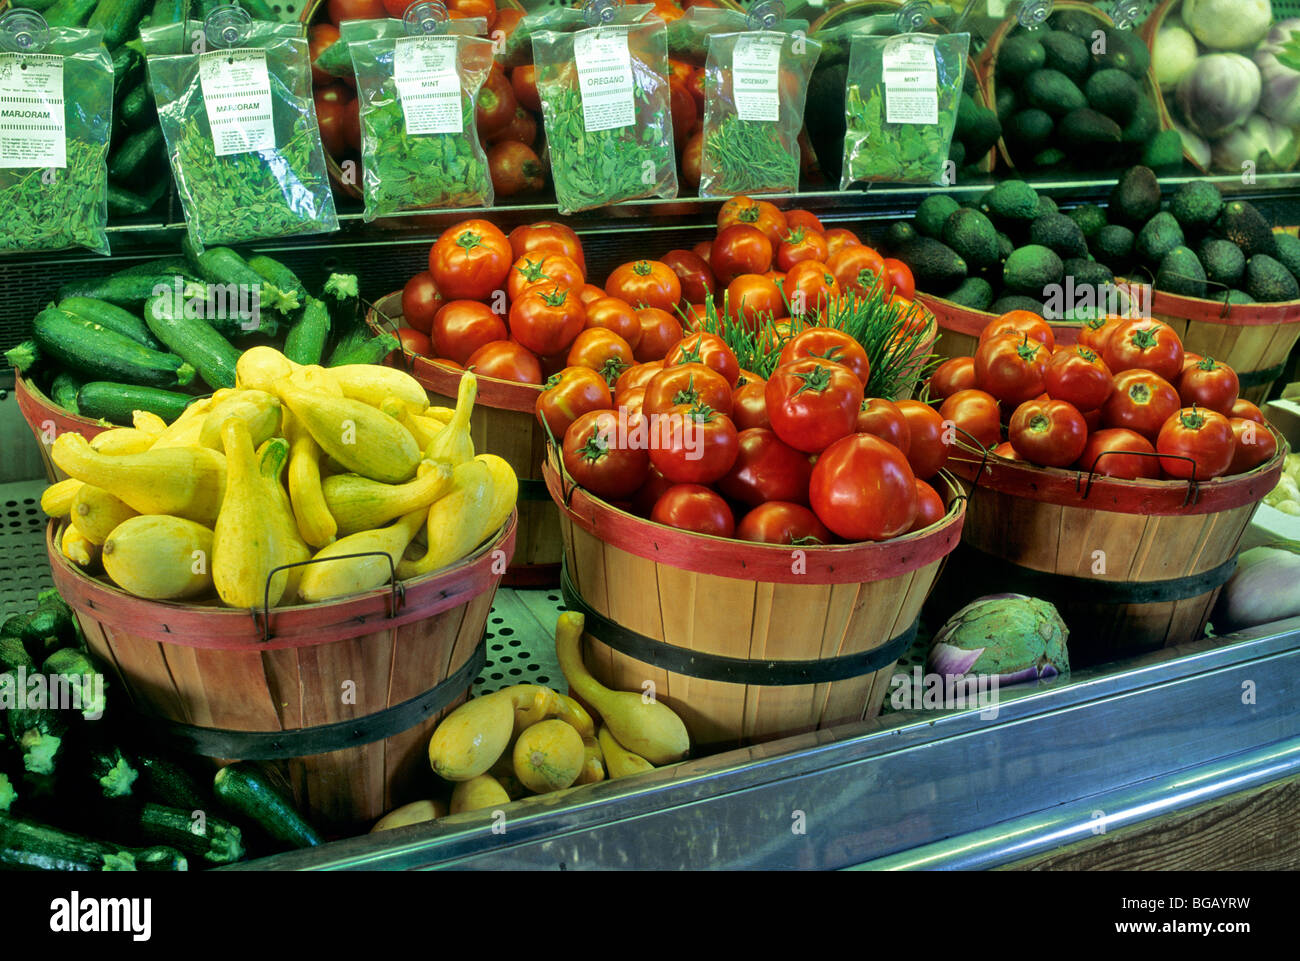 Légumes frais at produce stand, Californie Photo Stock